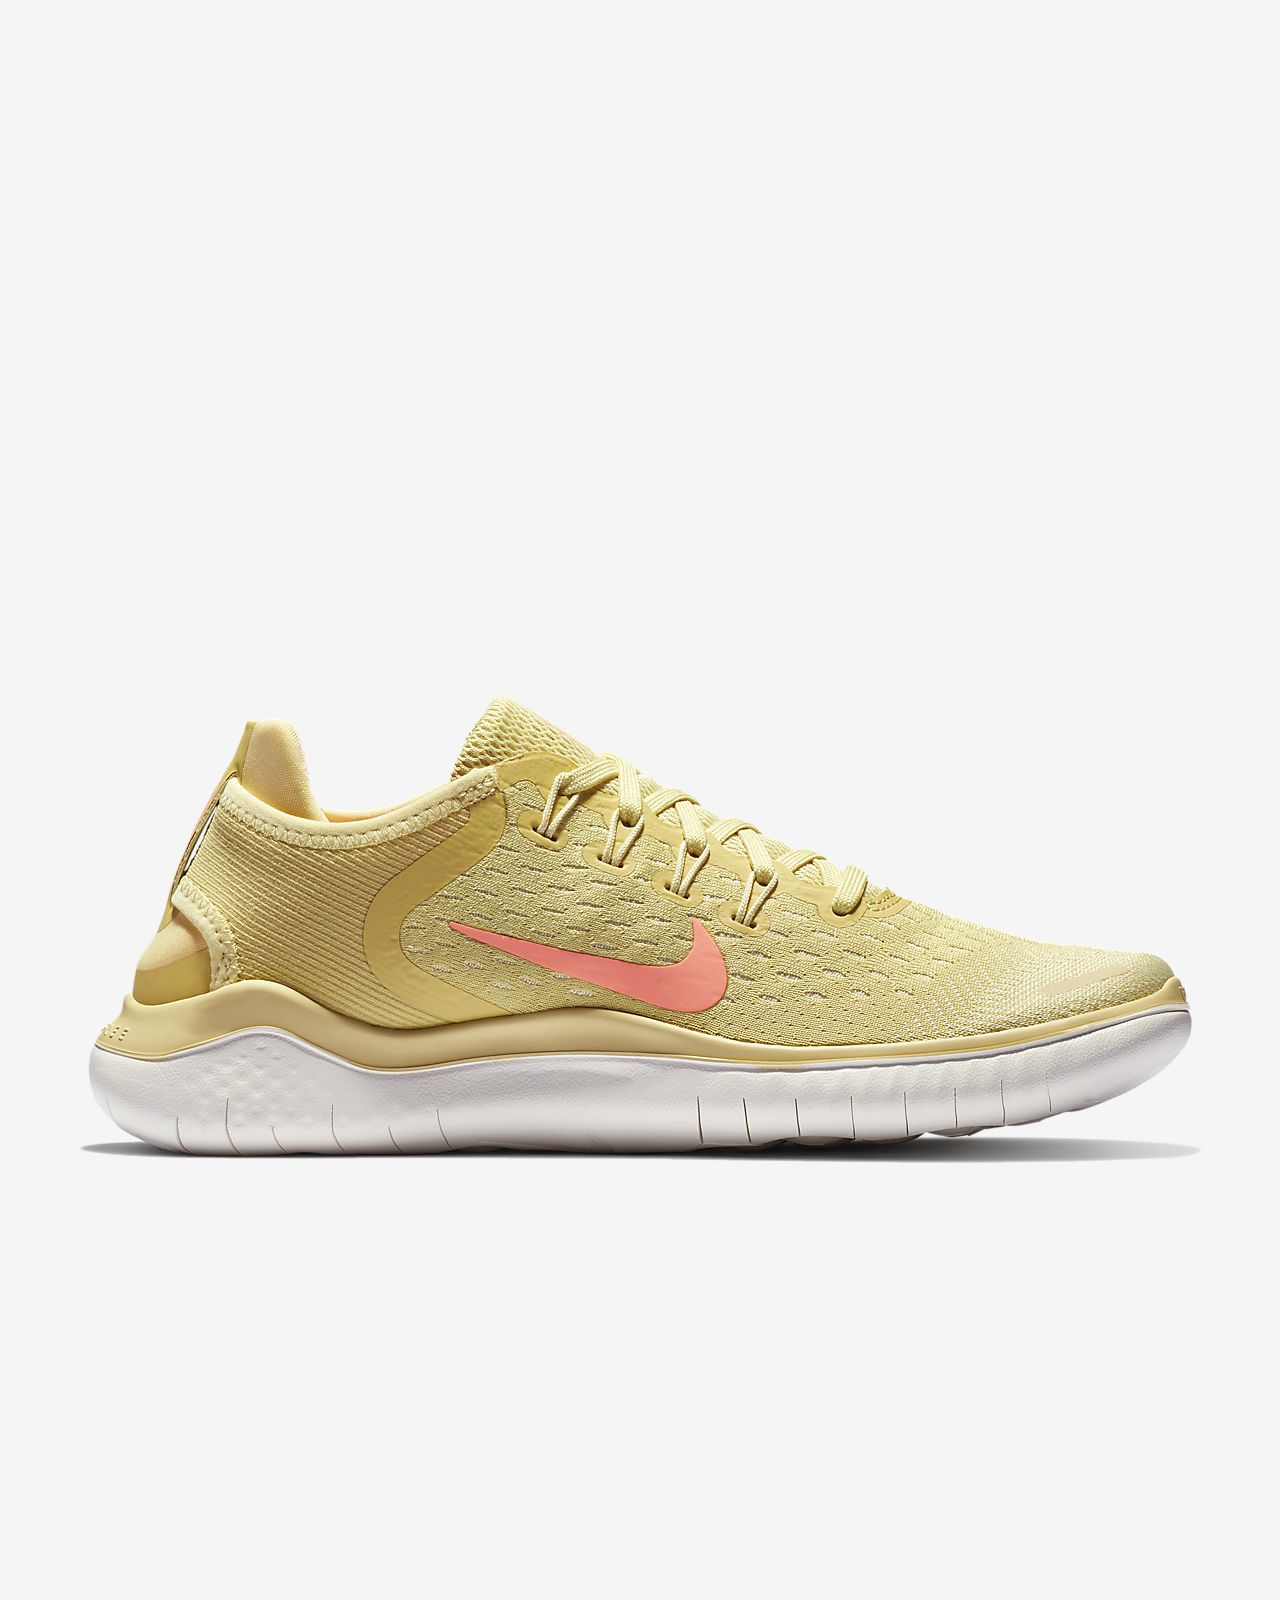 huge selection of 53094 8b8e9 Nike Free RN 2018 Summer